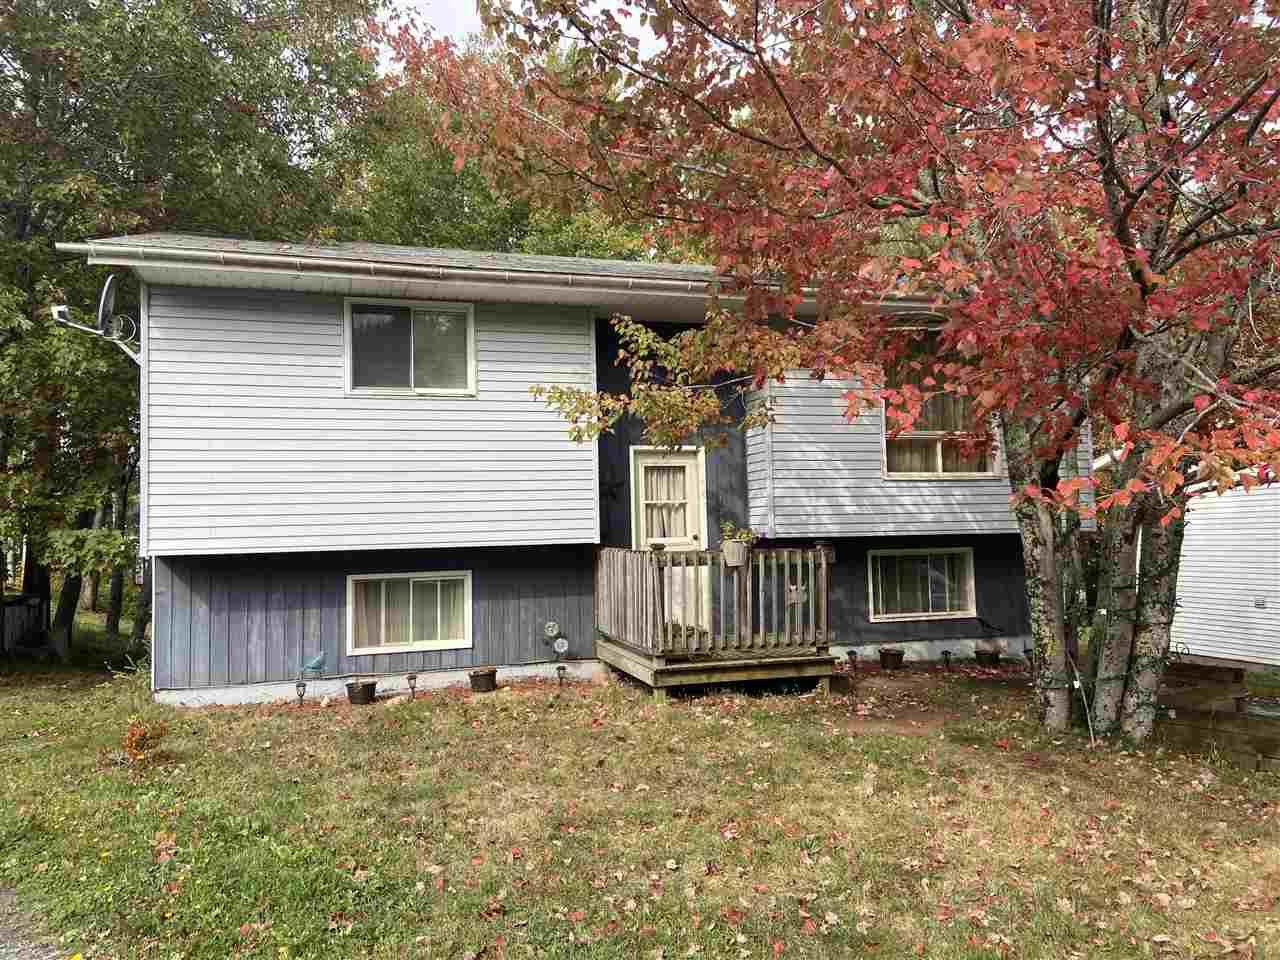 Main Photo: 49 Fourteenth Street in Trenton: 107-Trenton,Westville,Pictou Residential for sale (Northern Region)  : MLS®# 202024220